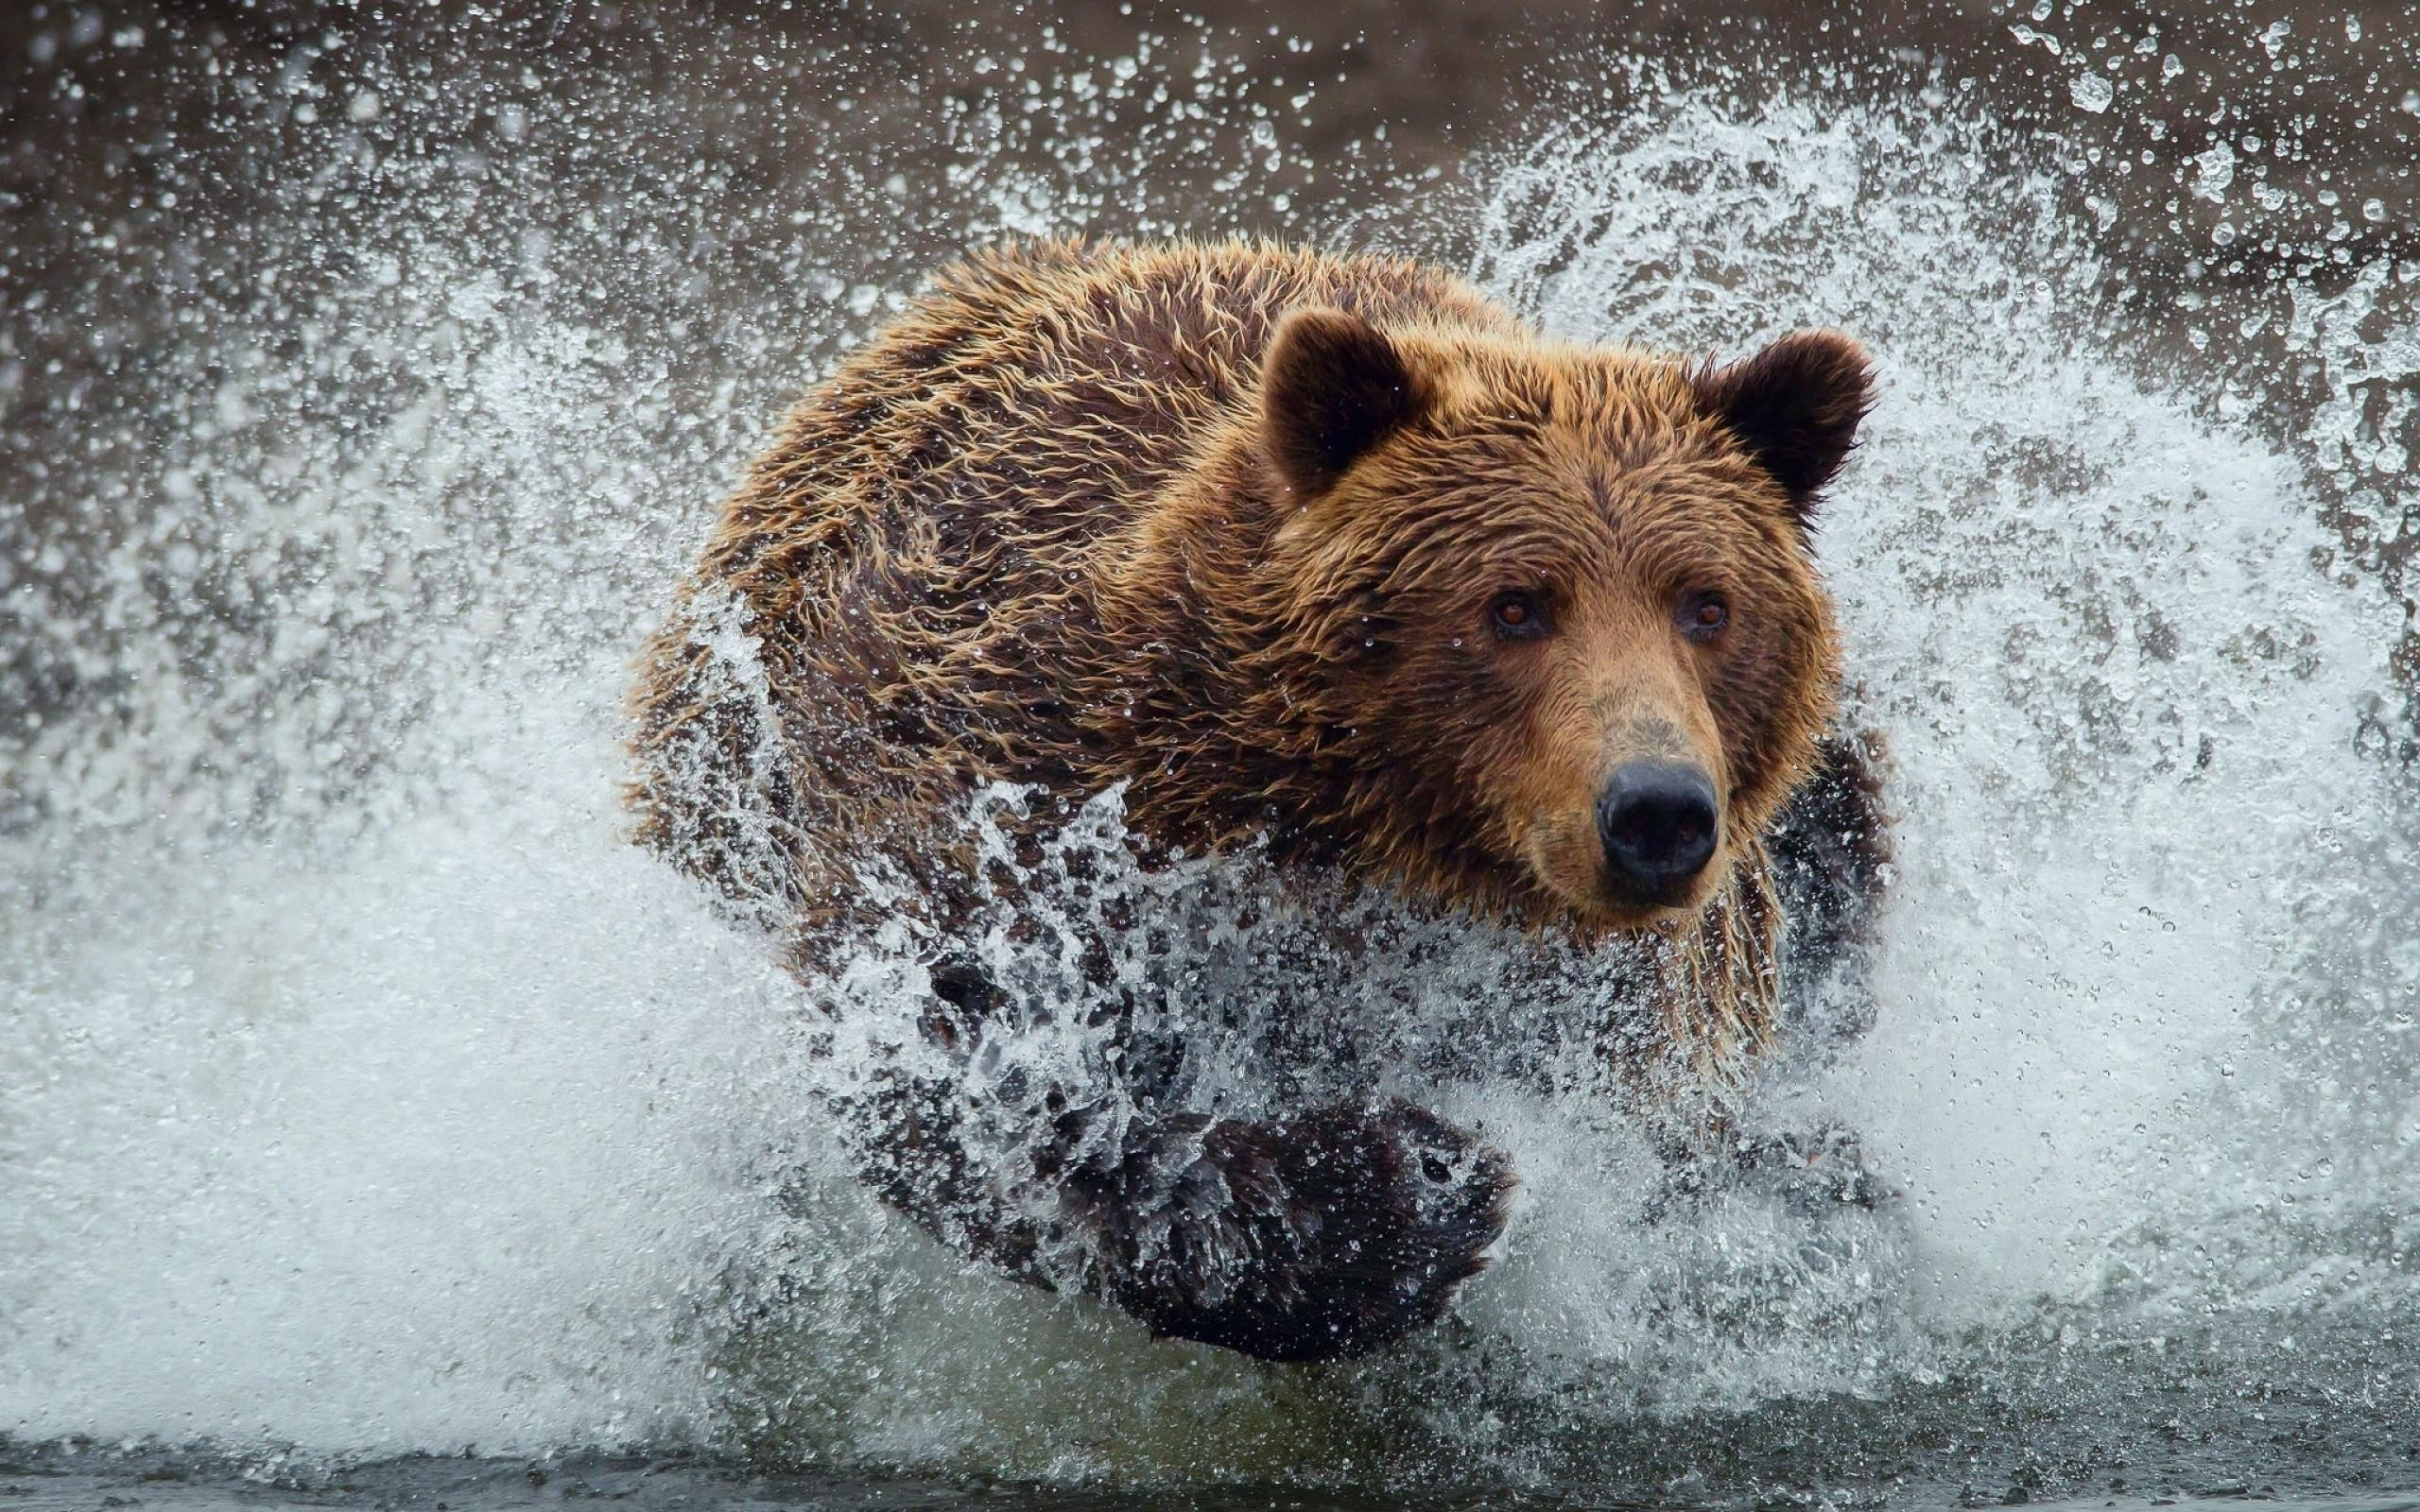 Grizzly Bear wallpaper | | 120630 | WallpaperUP